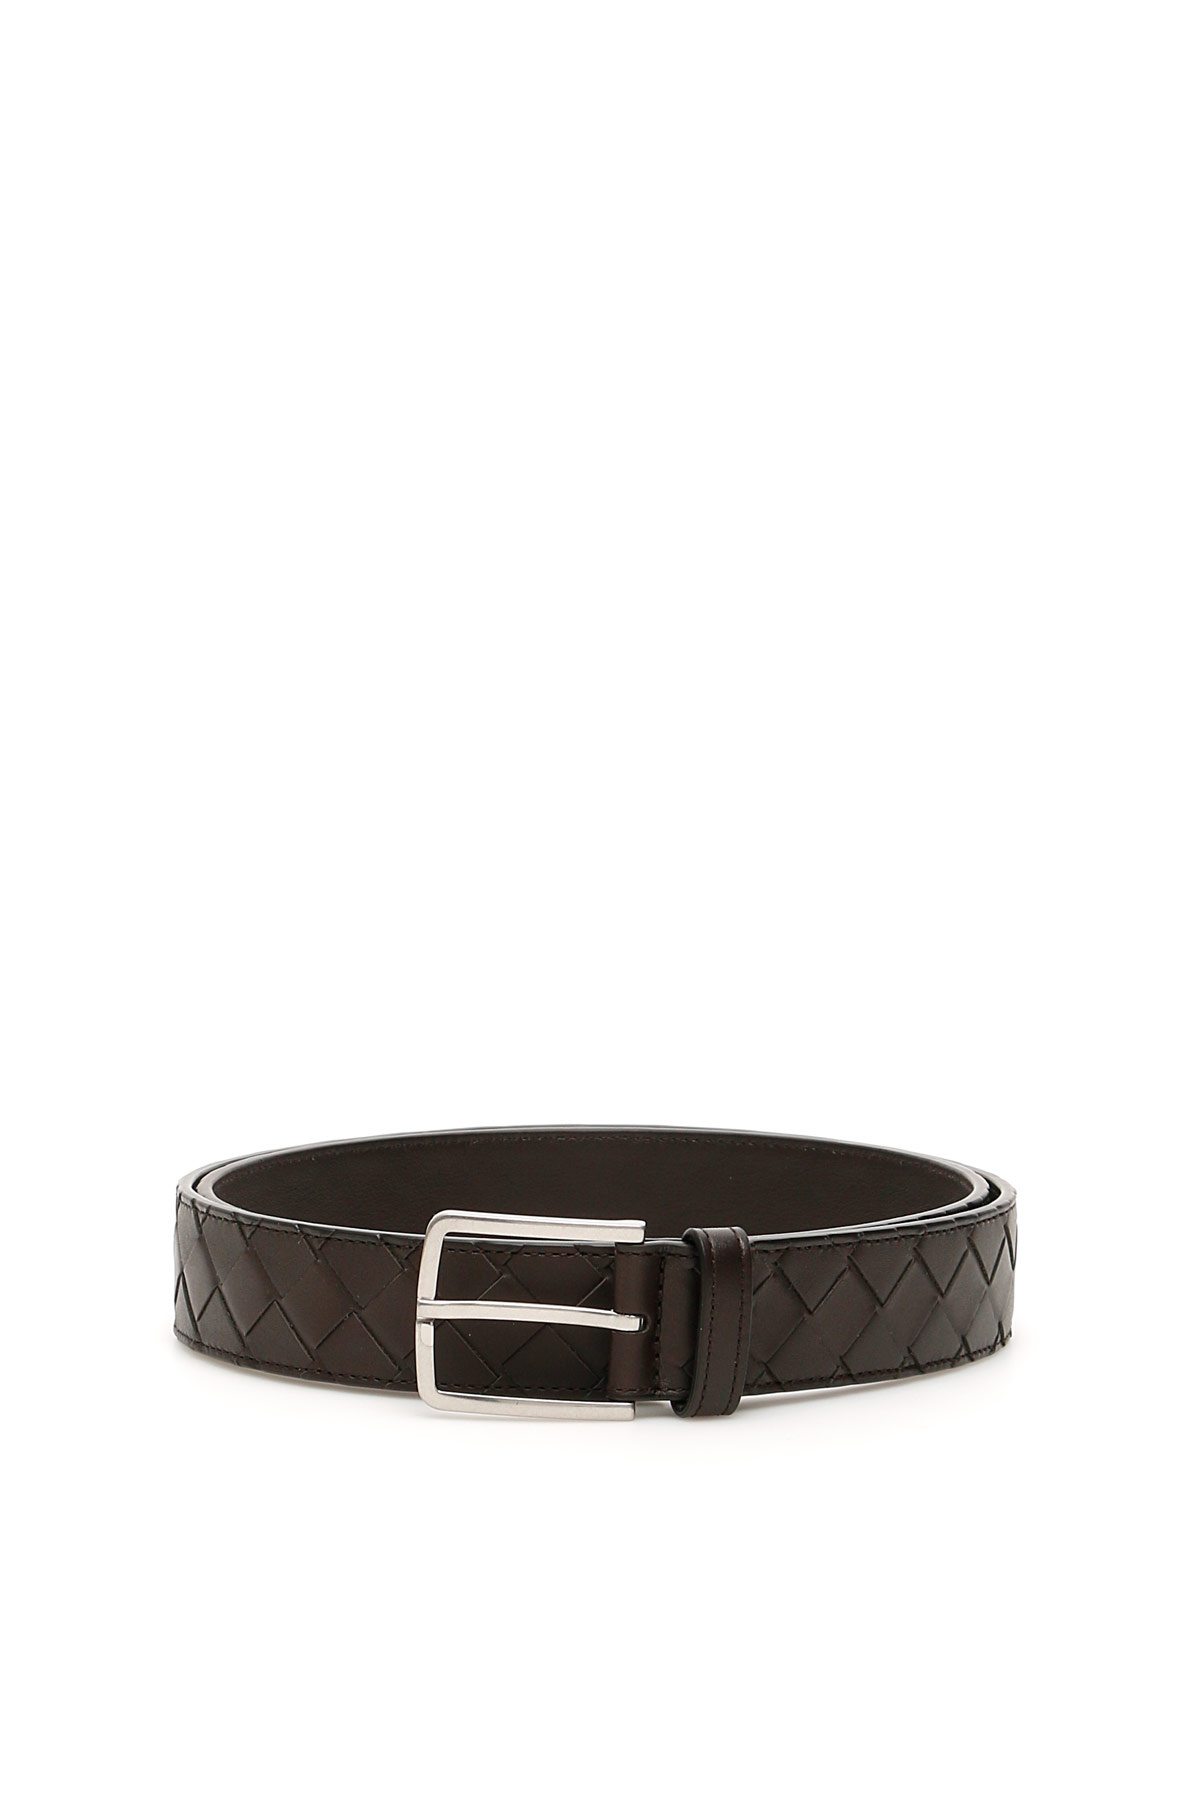 BOTTEGA VENETA INTRECCIATO 15 BELT 105 Brown Leather